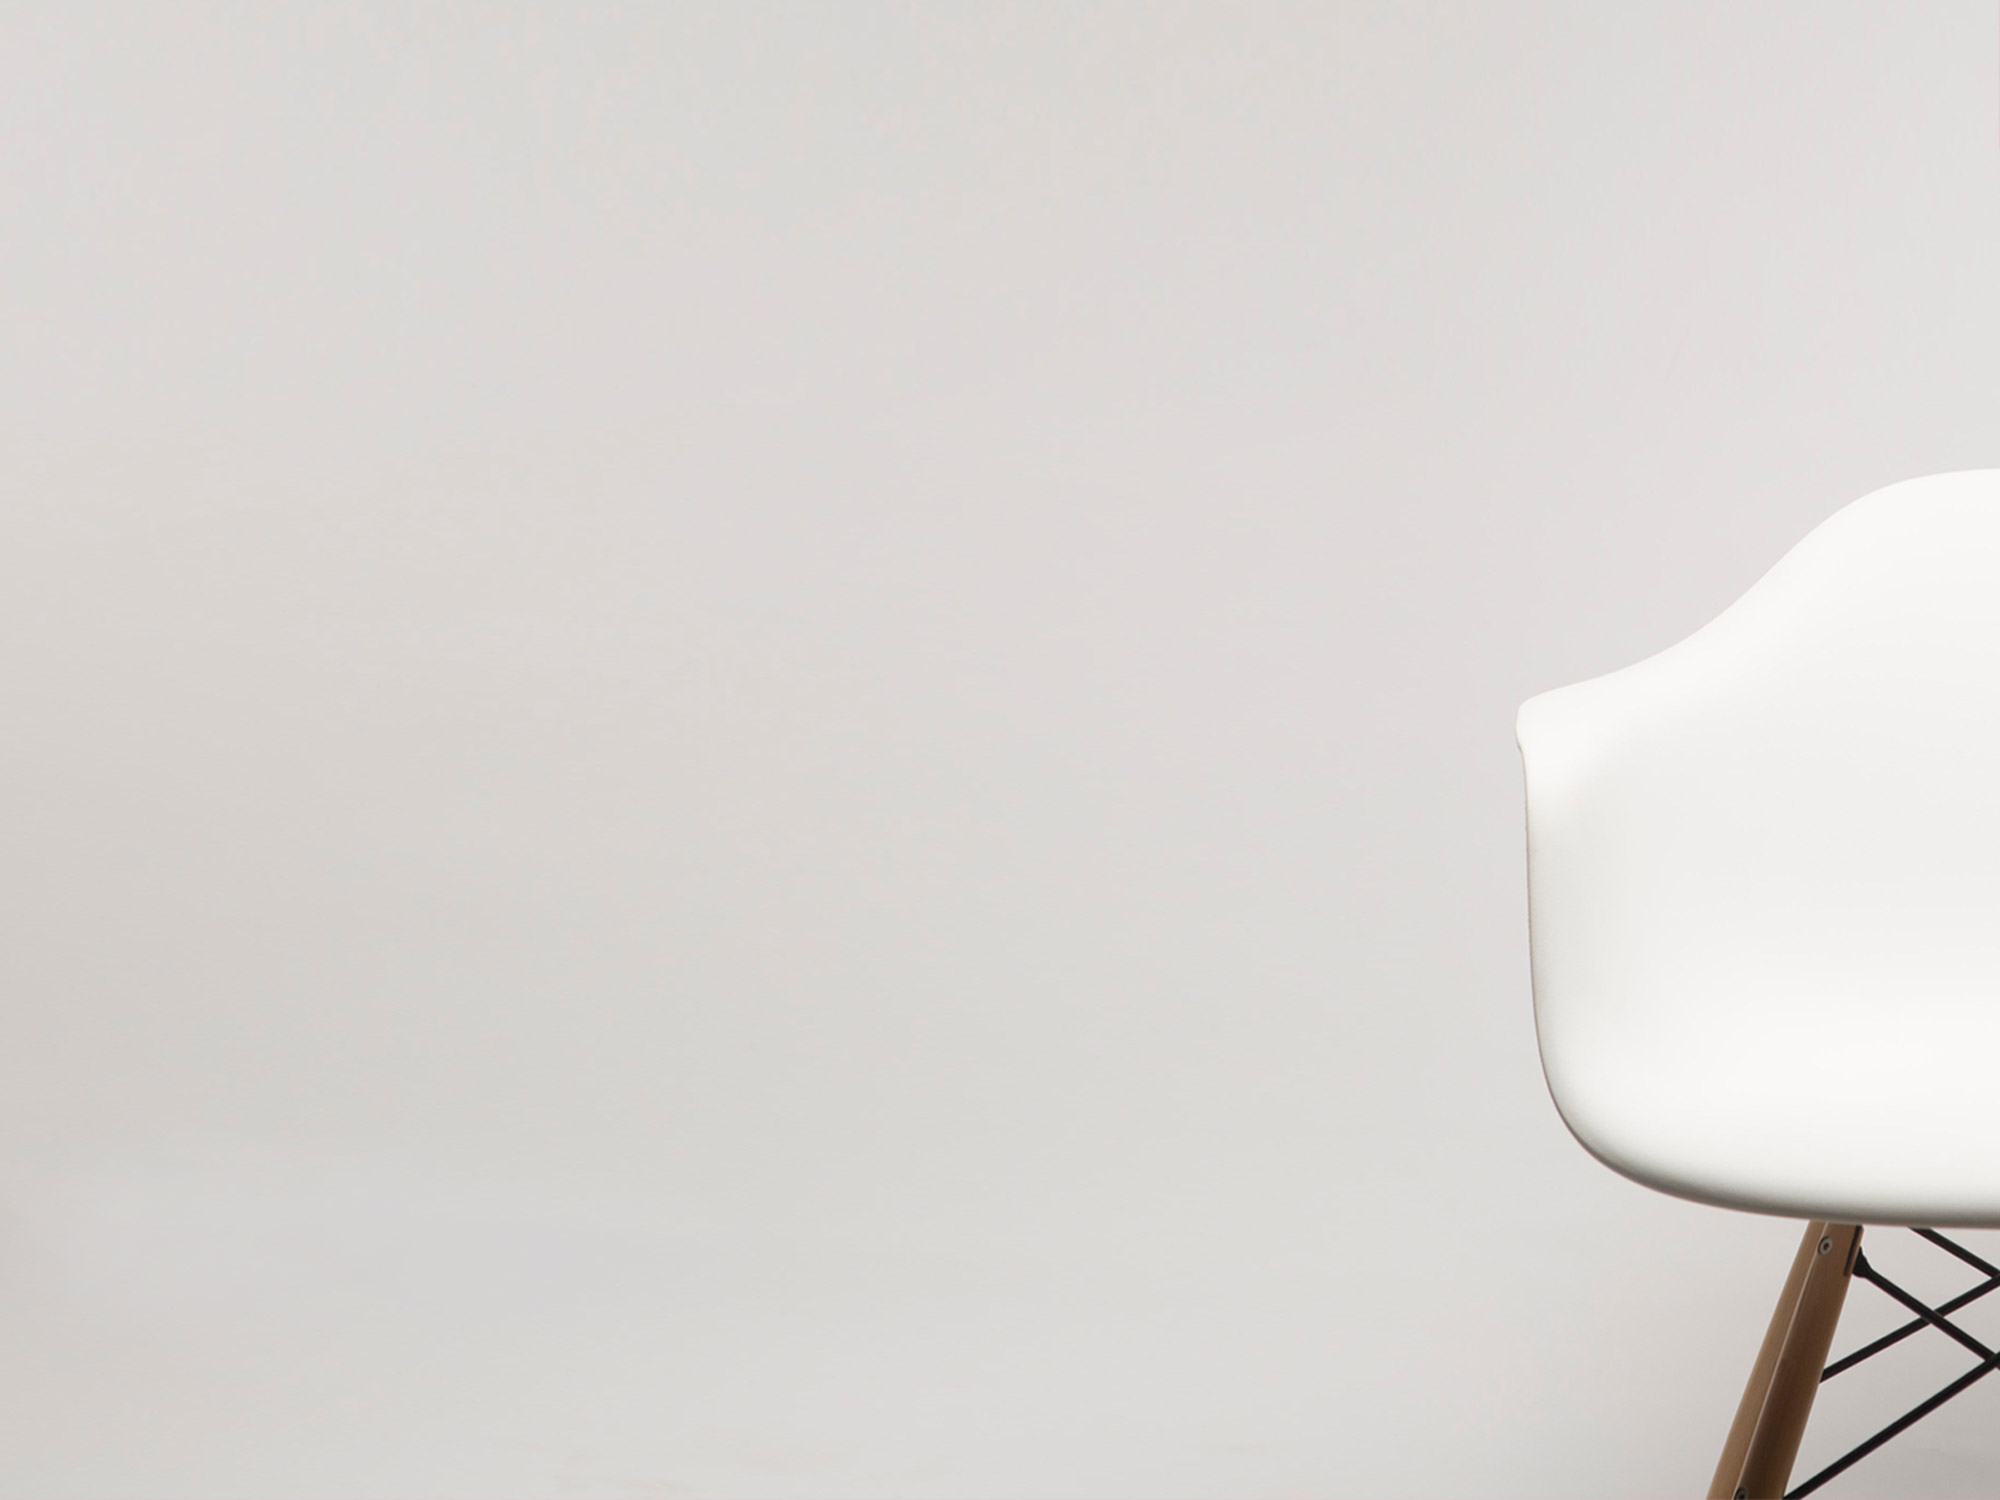 Konzepter / UX Designer (m/w/d) – München